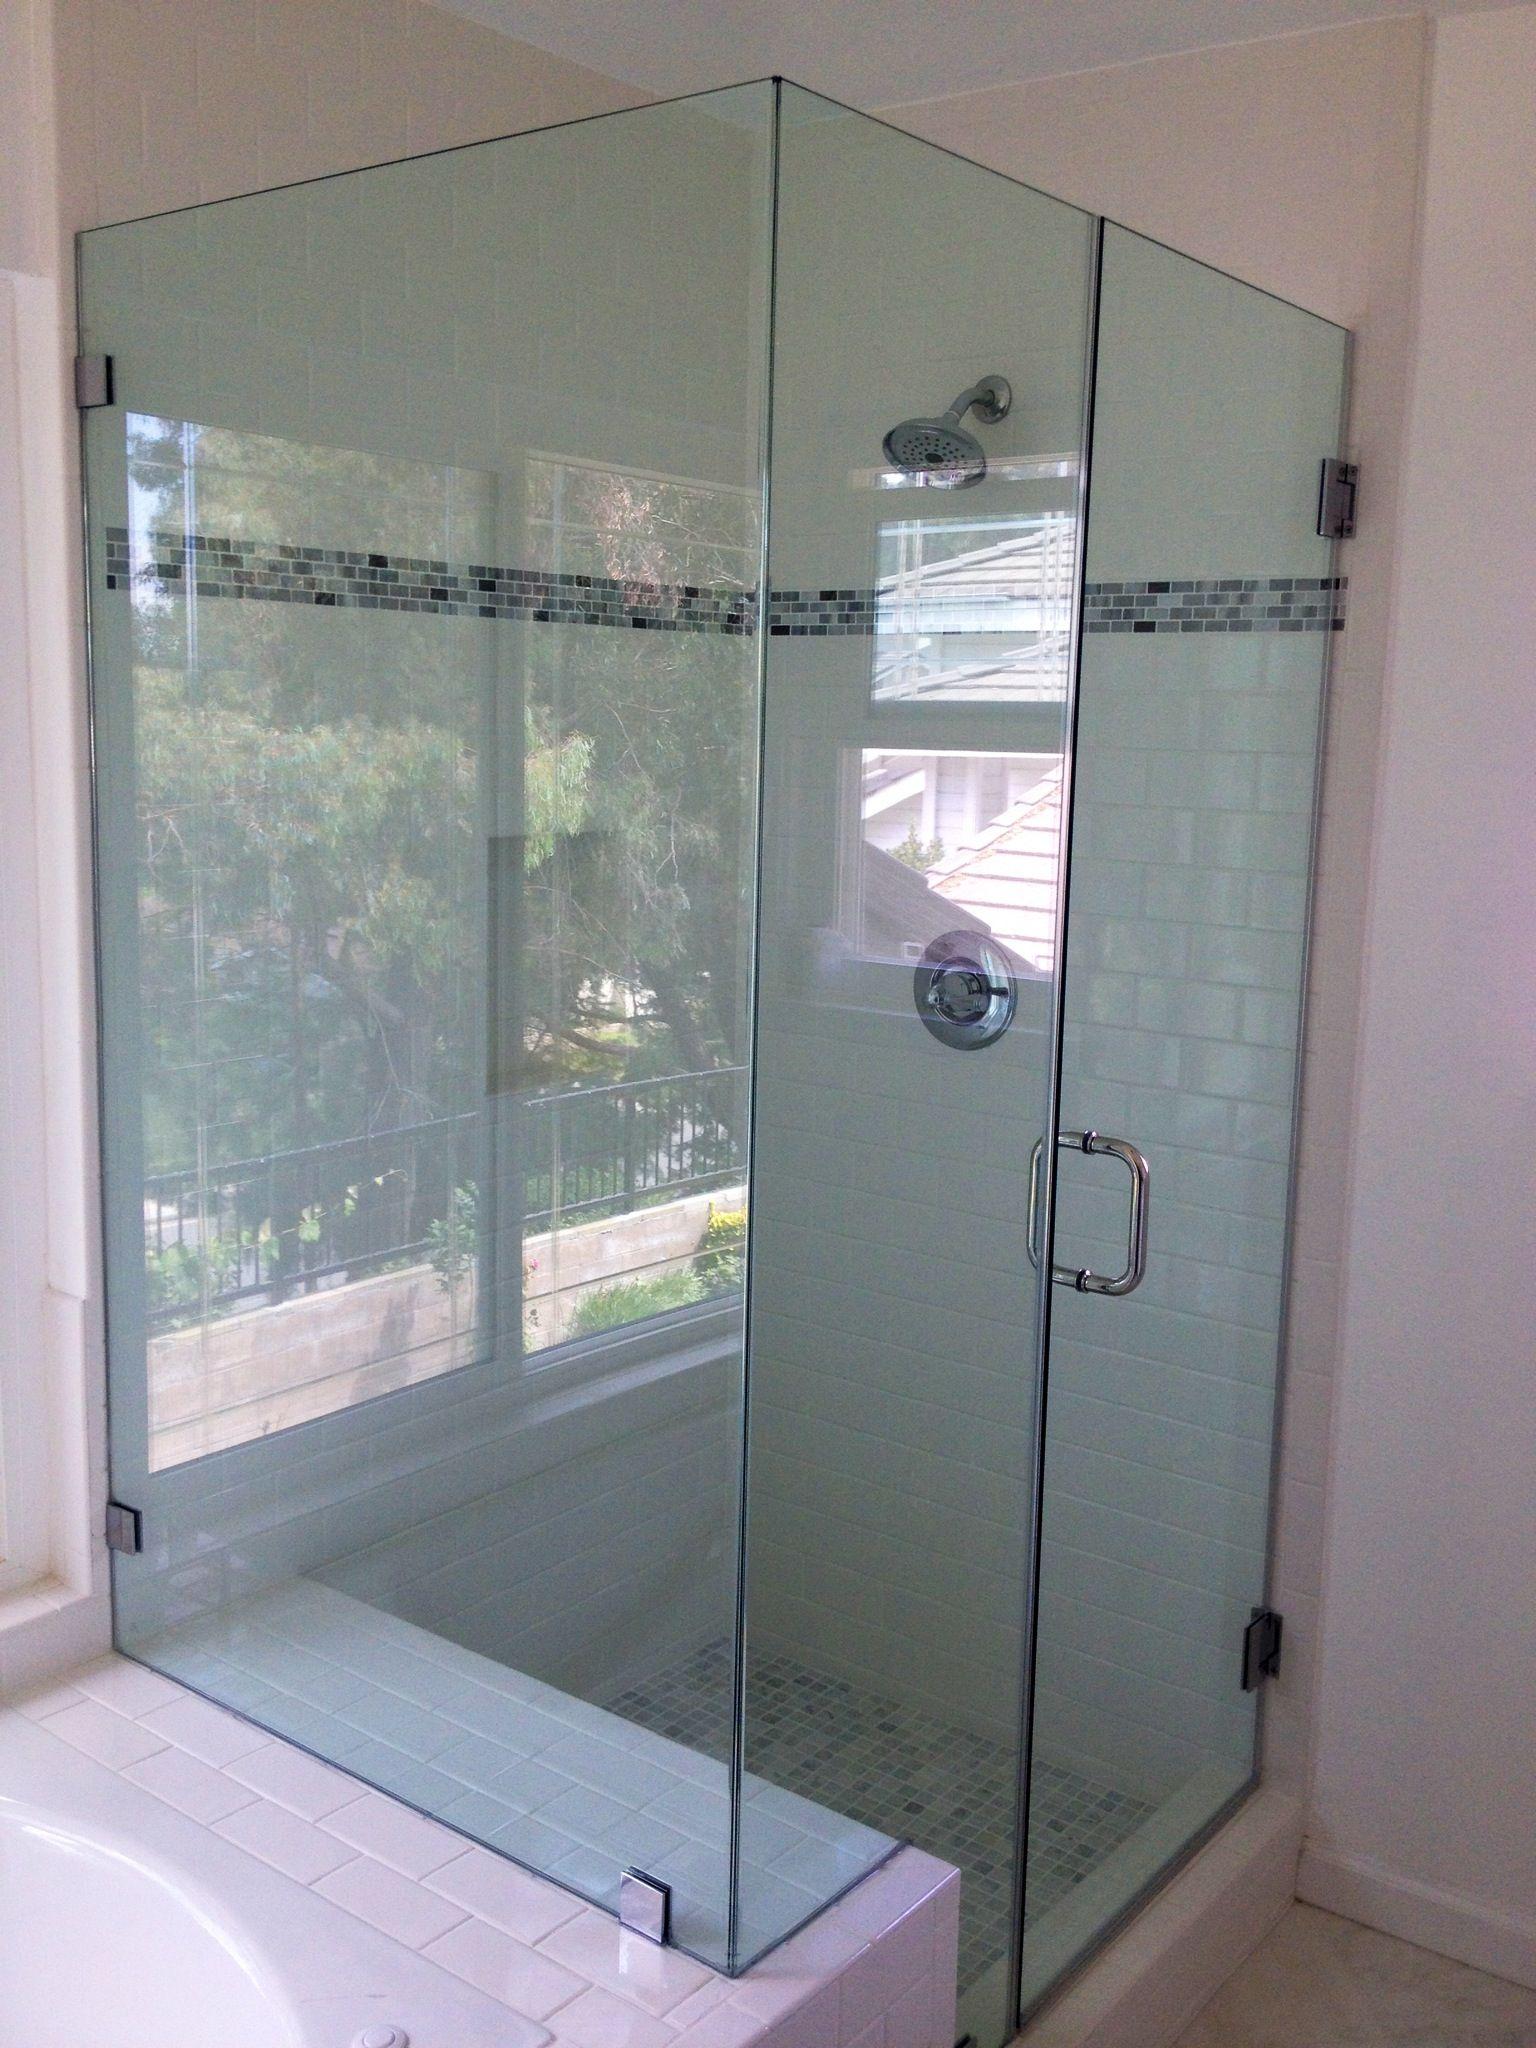 White Tile Accented By Frameless Shower Door By Algamiglassdoors